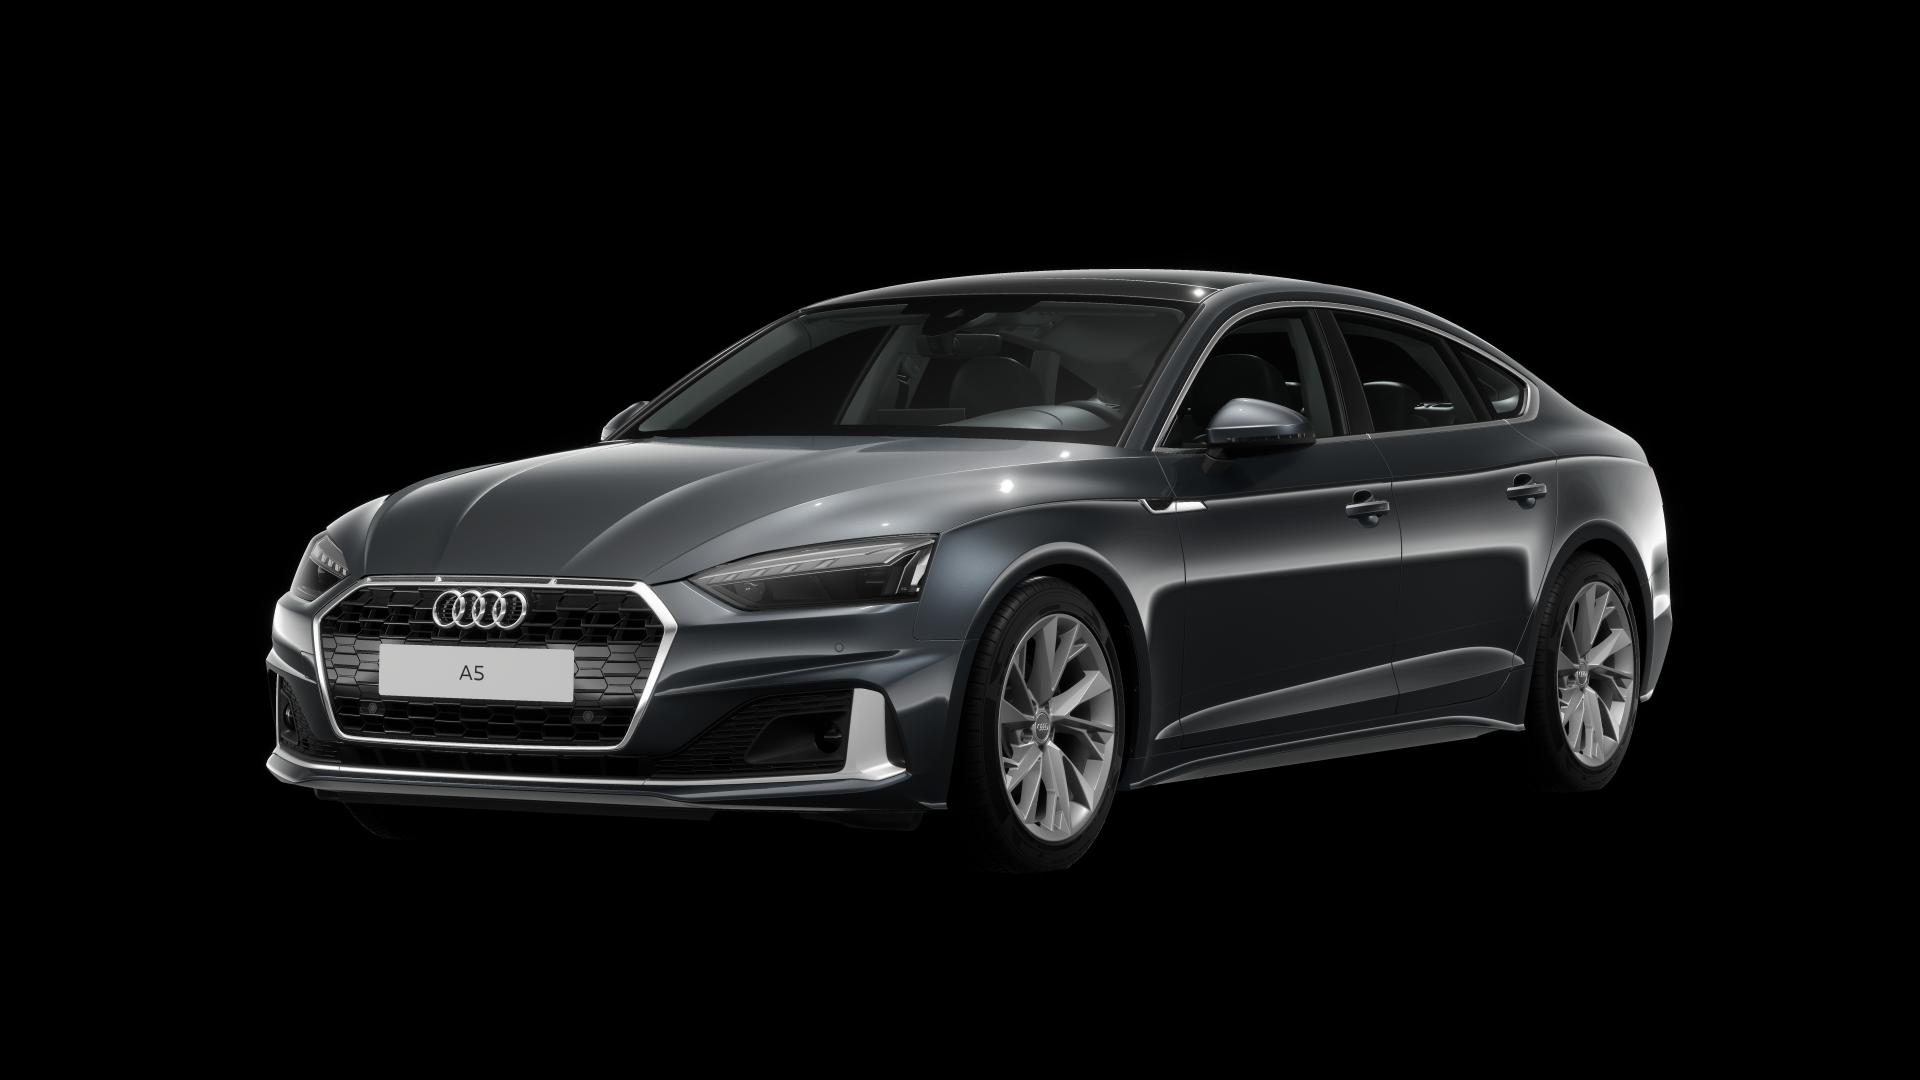 Audi A5 Sportback Business Edition advanced 35 TDI  120(163) kW(pk) S tronic